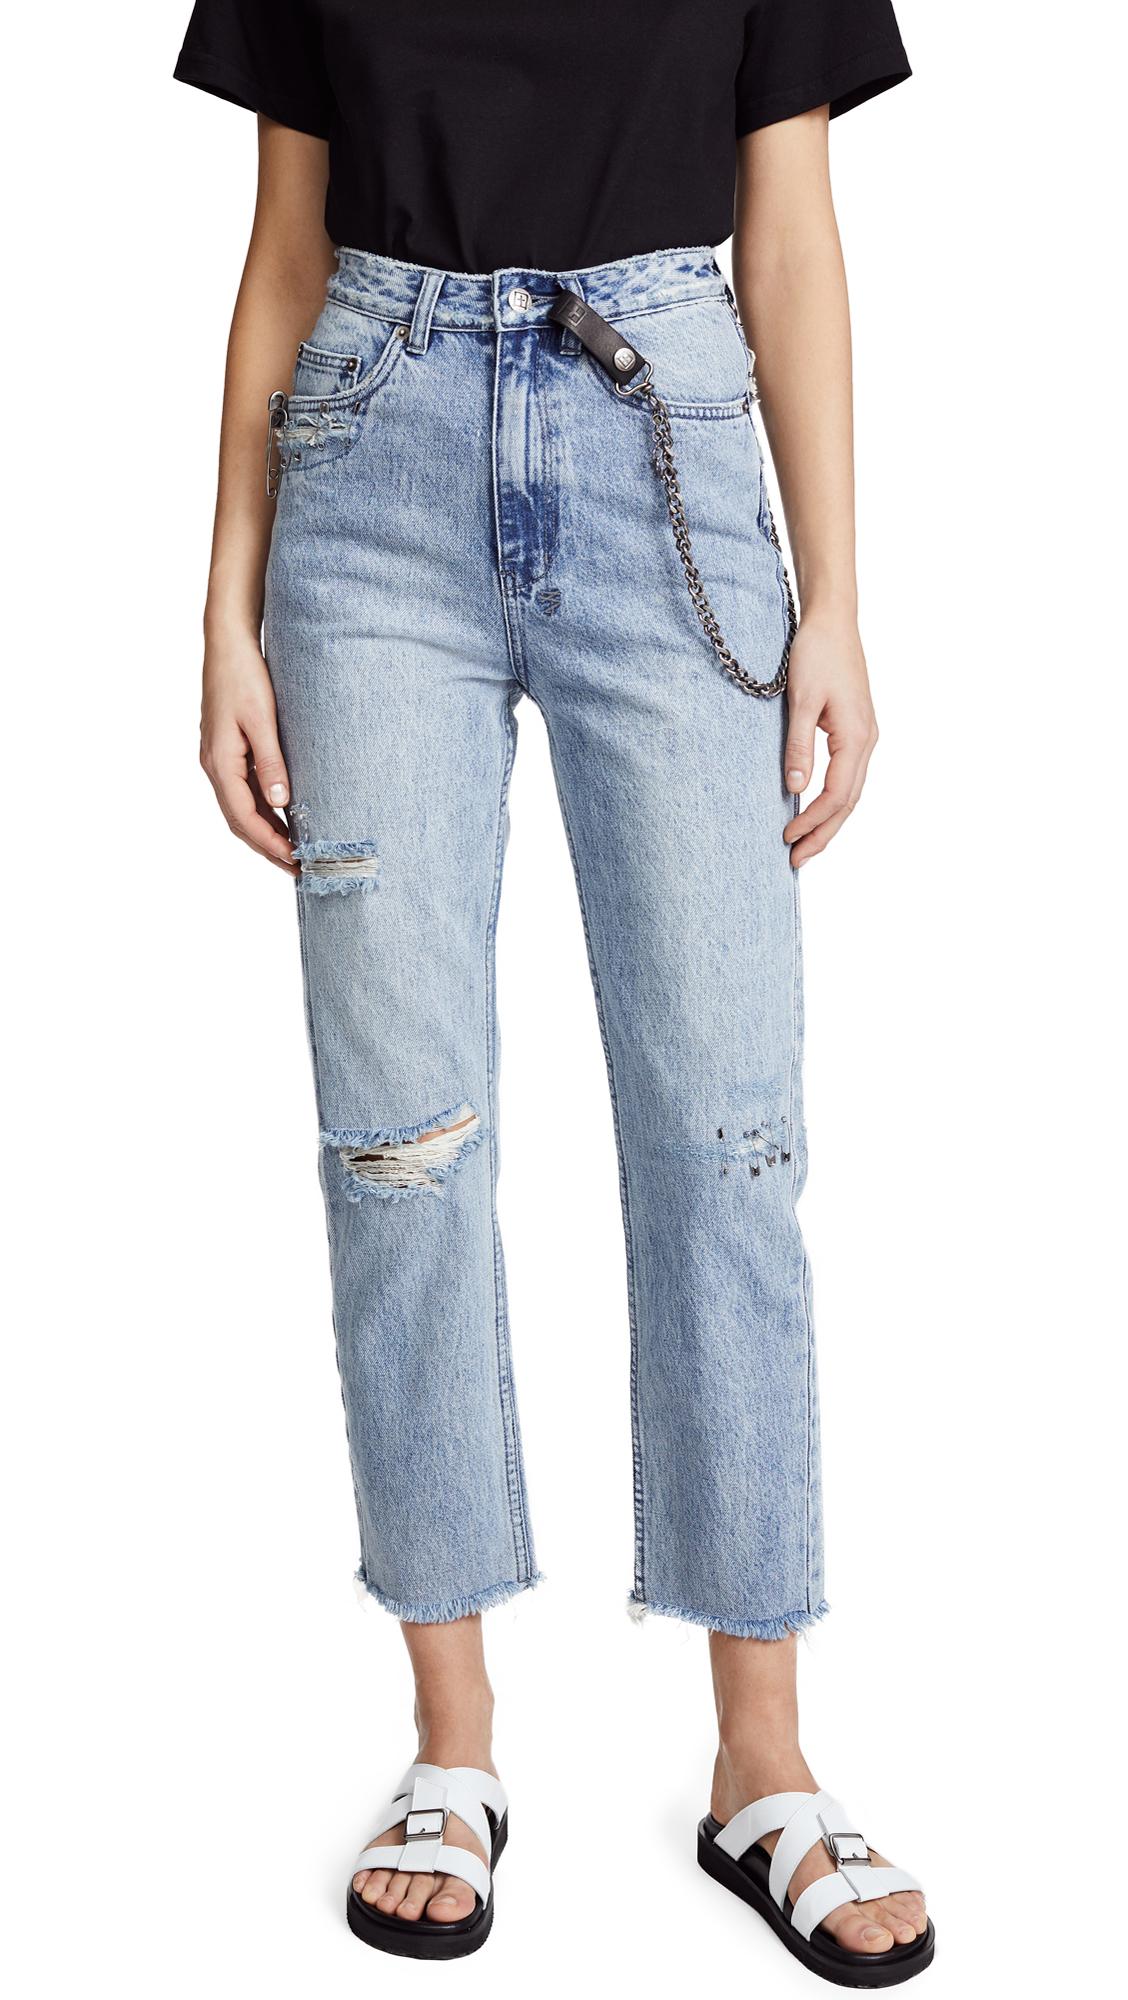 Ksubi Chlo Wasted Straight Leg Jeans